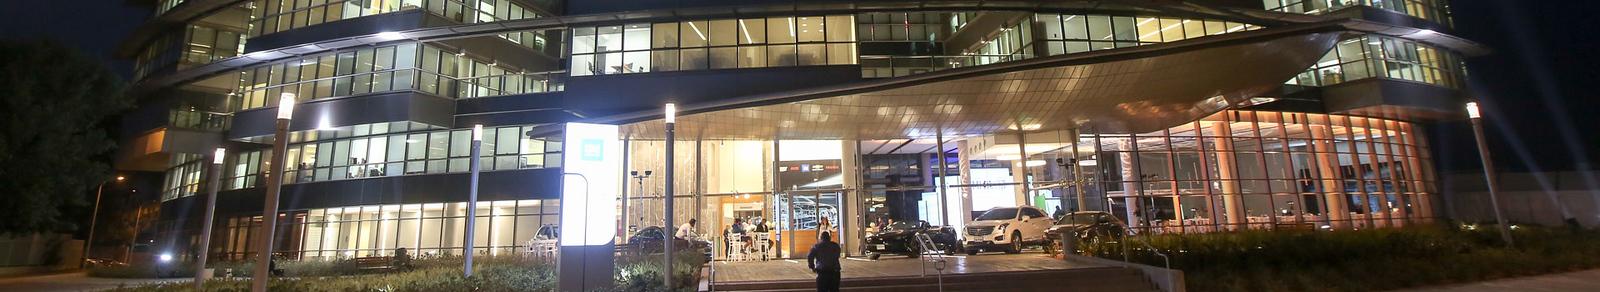 UMI & AVIS HQ THE OPENING CEREMONY